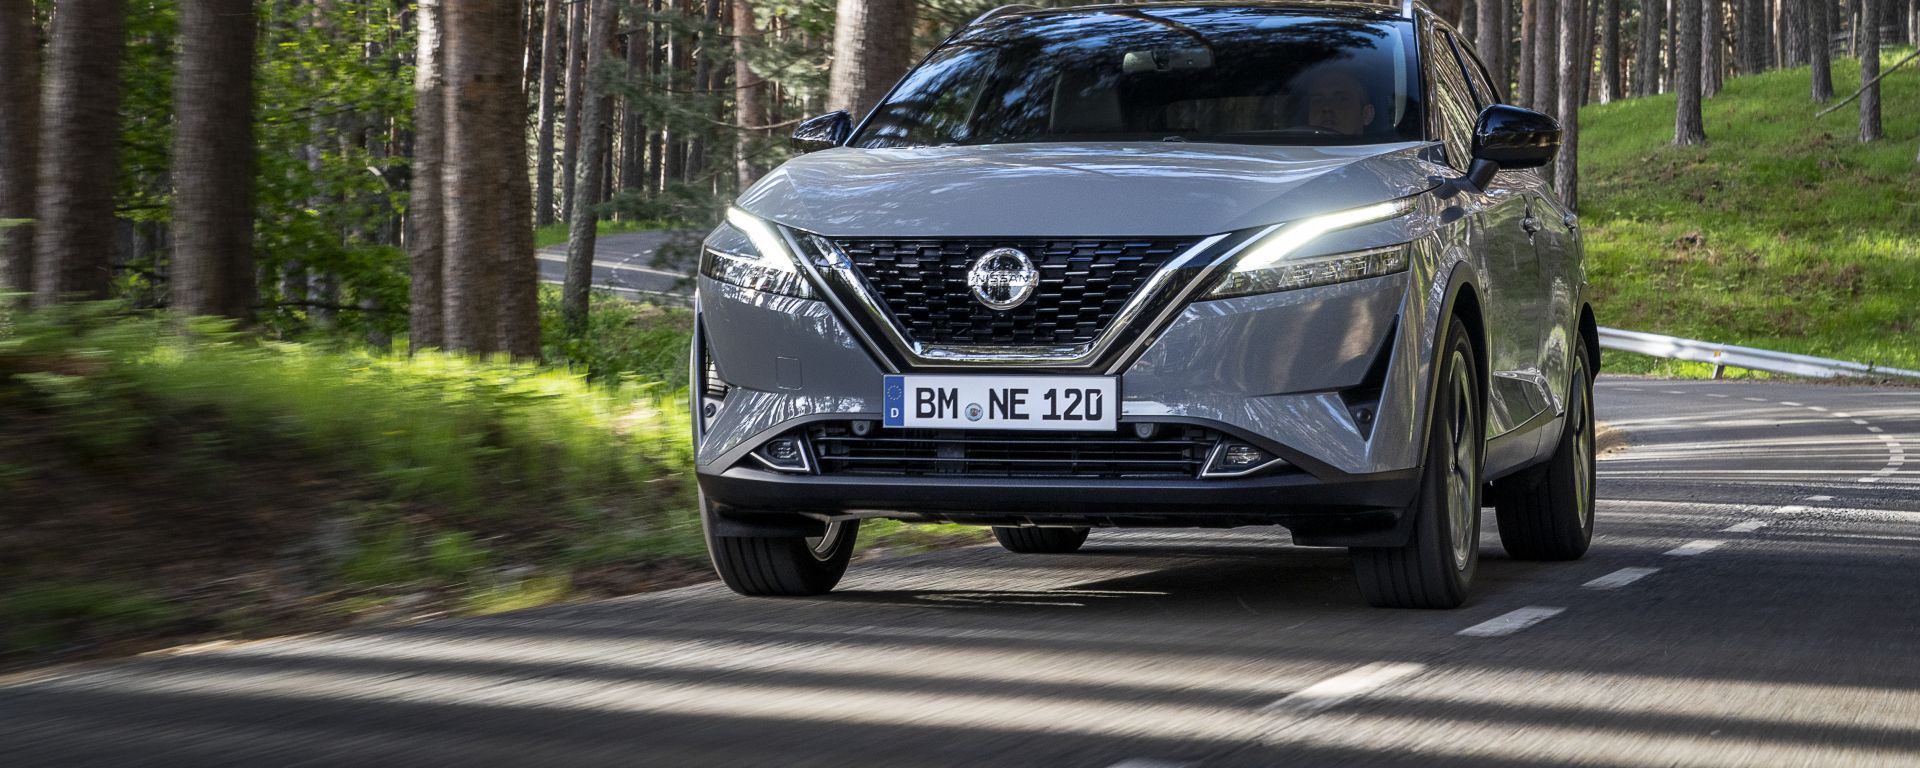 Nuovo Nissan Qashqai (2021): fotogallery